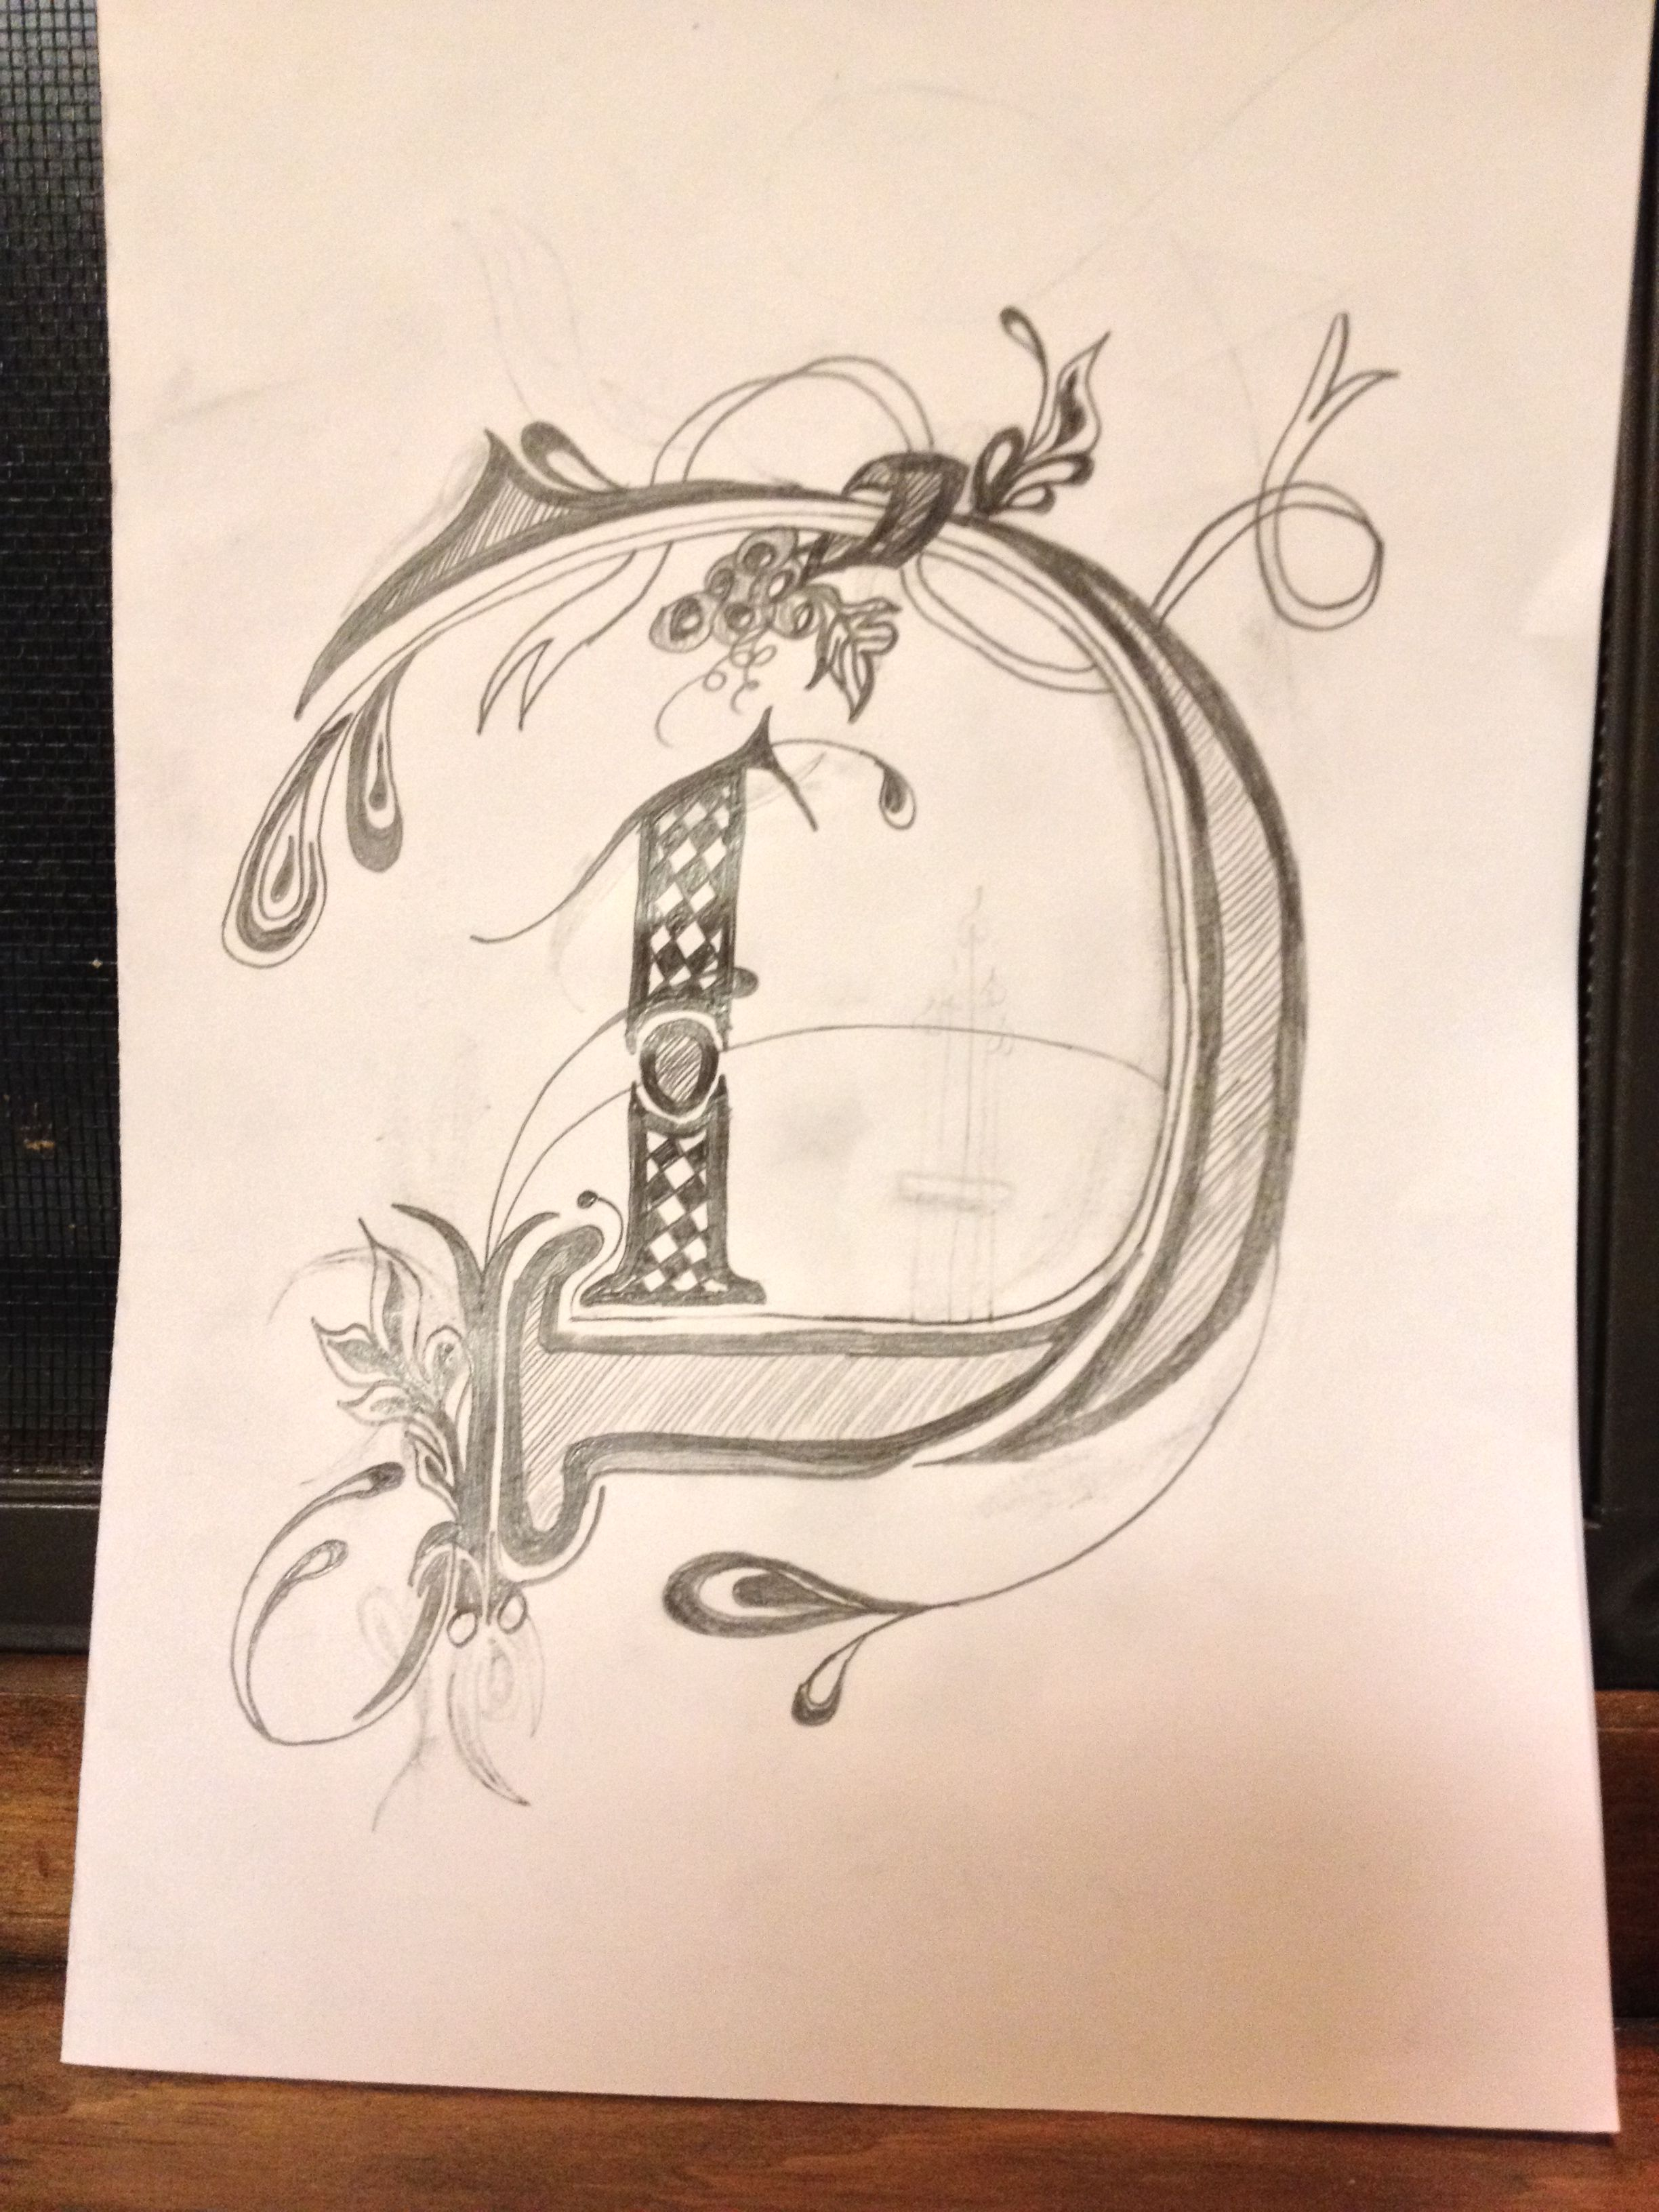 2448x3264 Pencil Sketch Letter D D Is For Debra